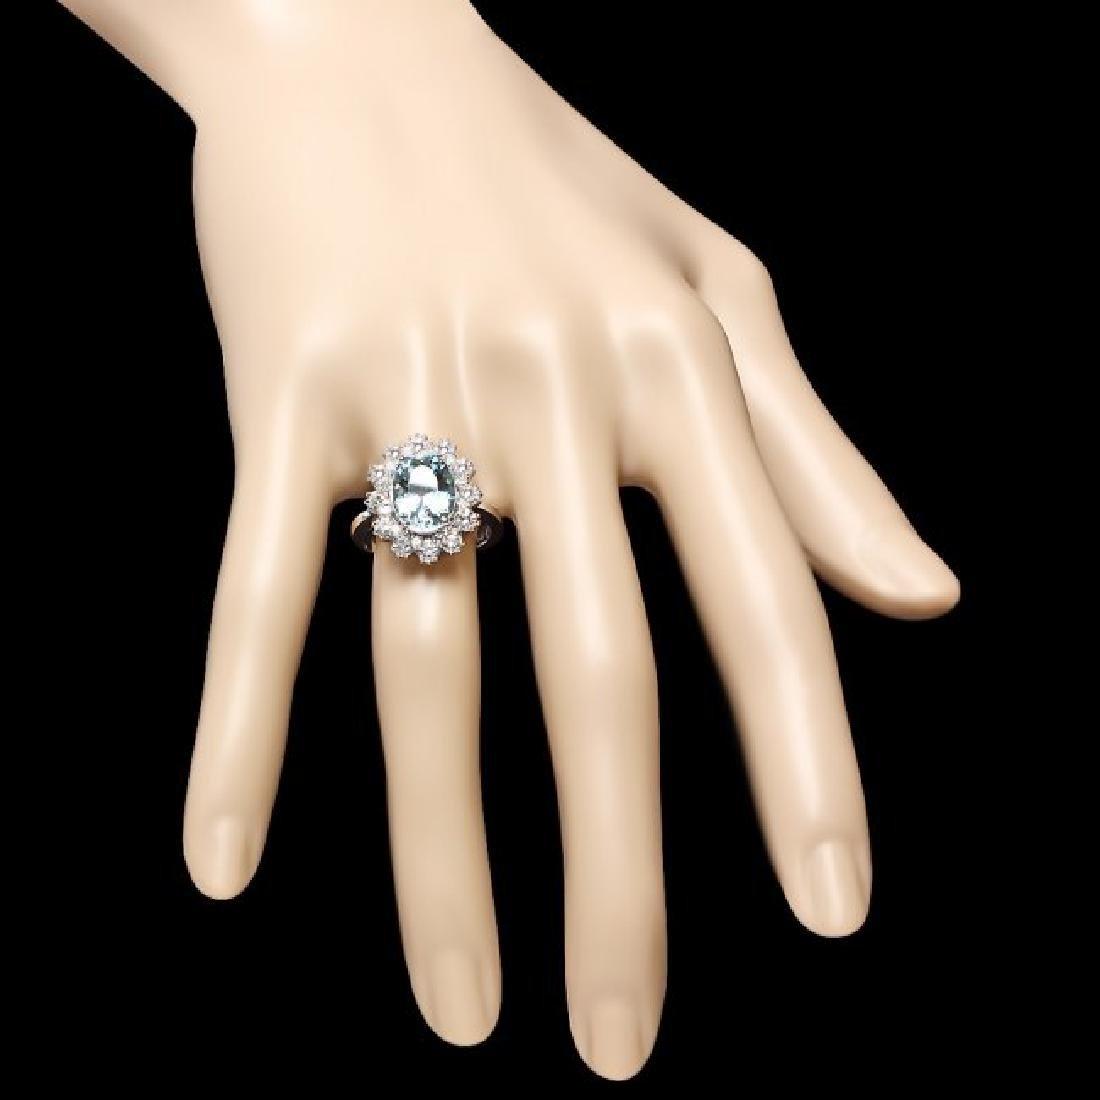 14k Gold 1.25ct Aquamarine 1.25ct Diamond Ring - 4